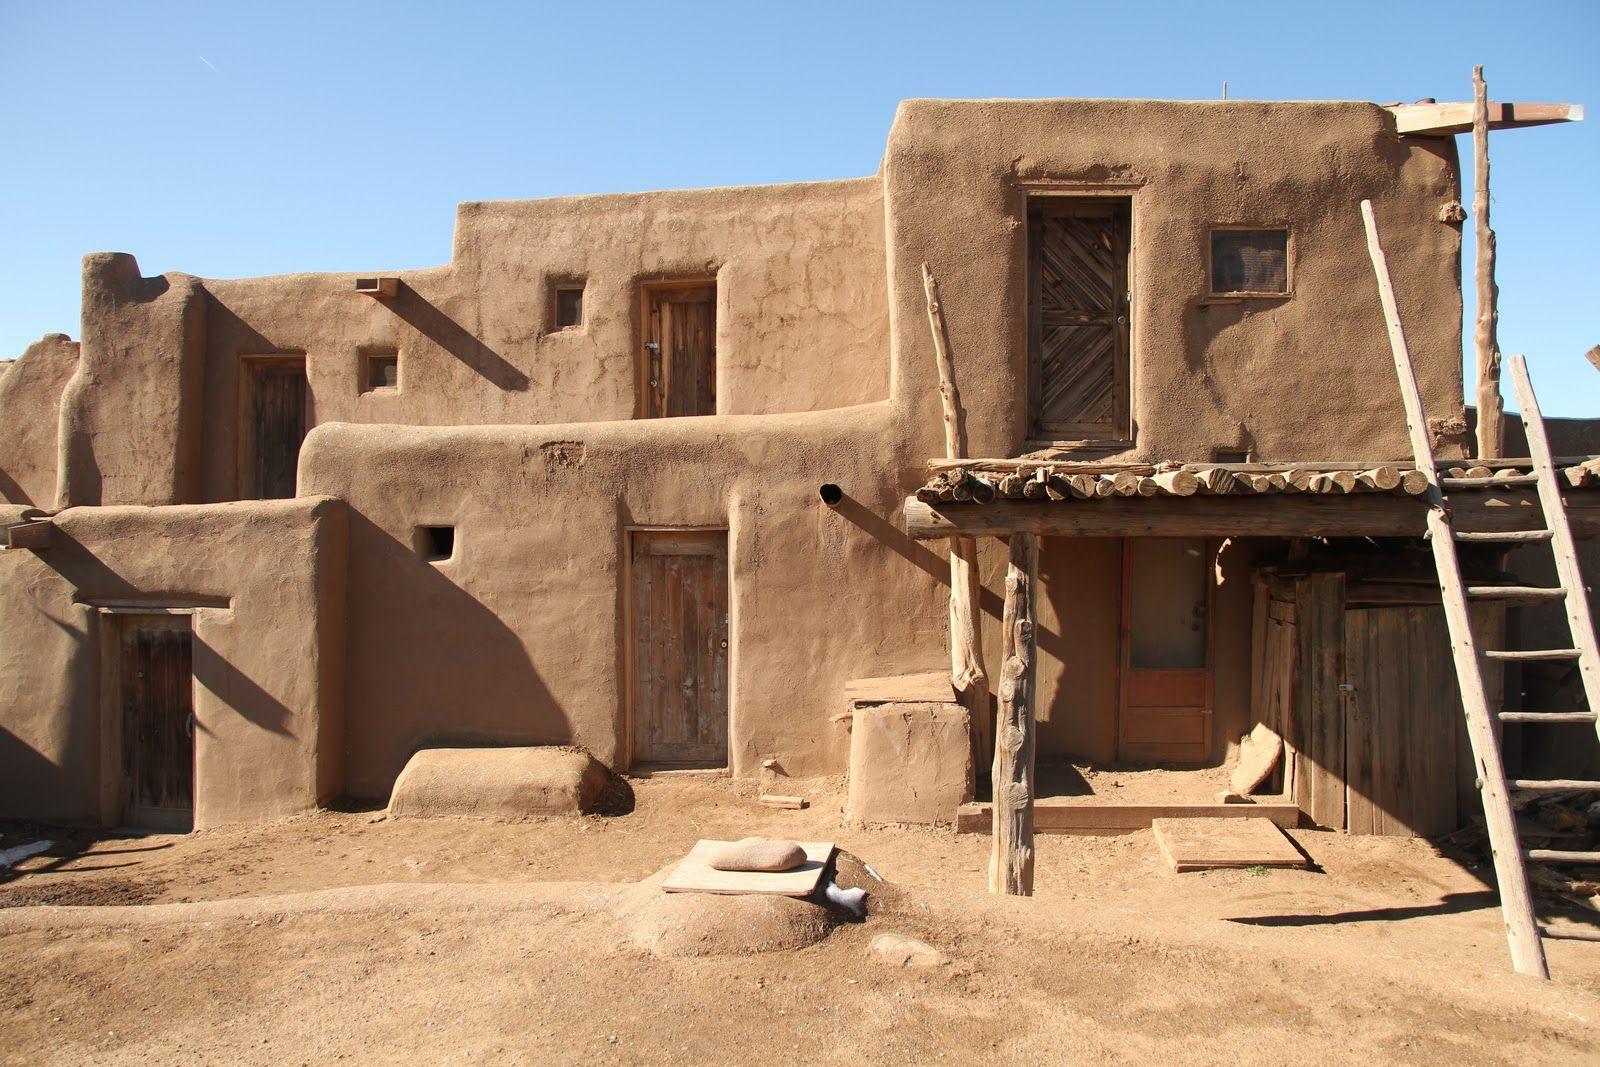 Pueblo House Jpg Jpeg Image 1600 1067 Pixels Scaled 84 Native American Houses Adobe House Pueblo House